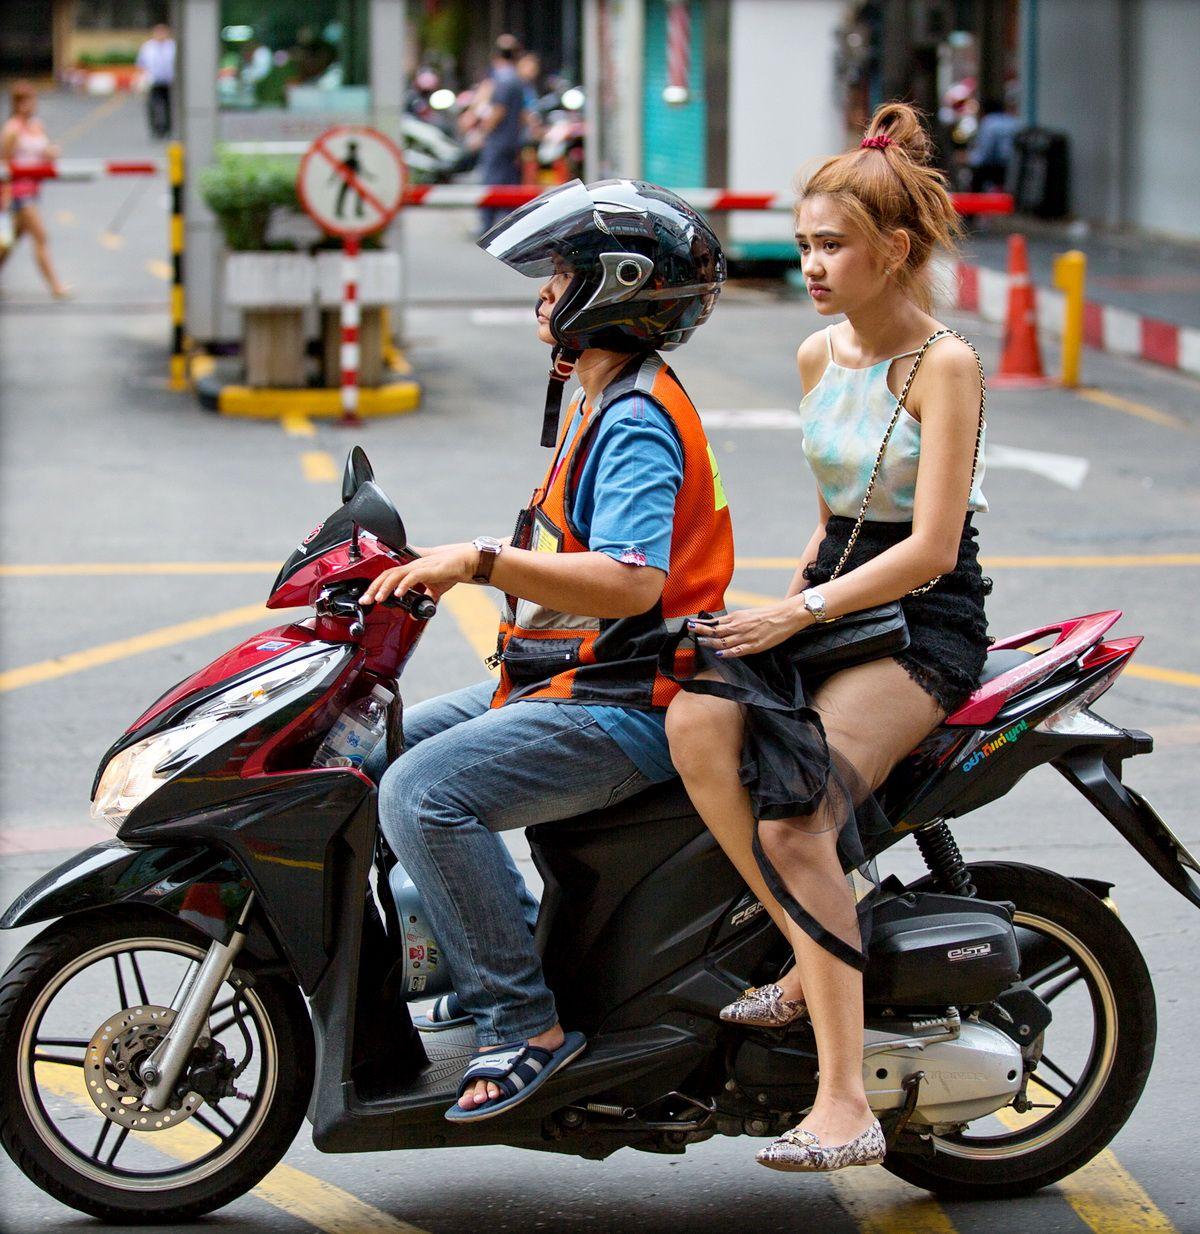 Naked lesbians on motorcycles, teen marvel melanie